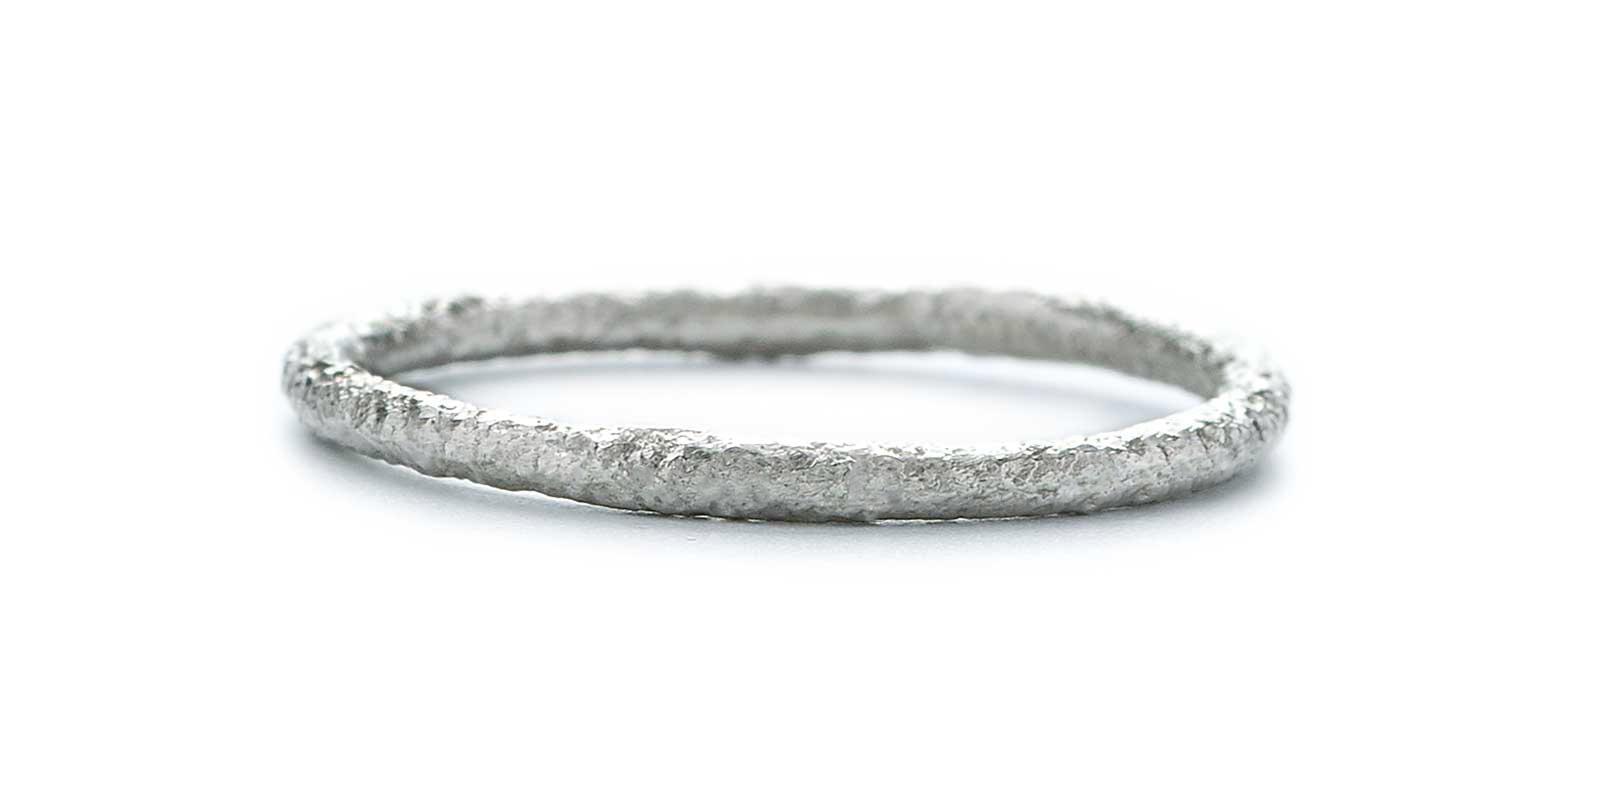 Scattered Platinum Wedding Ring 1.5mm